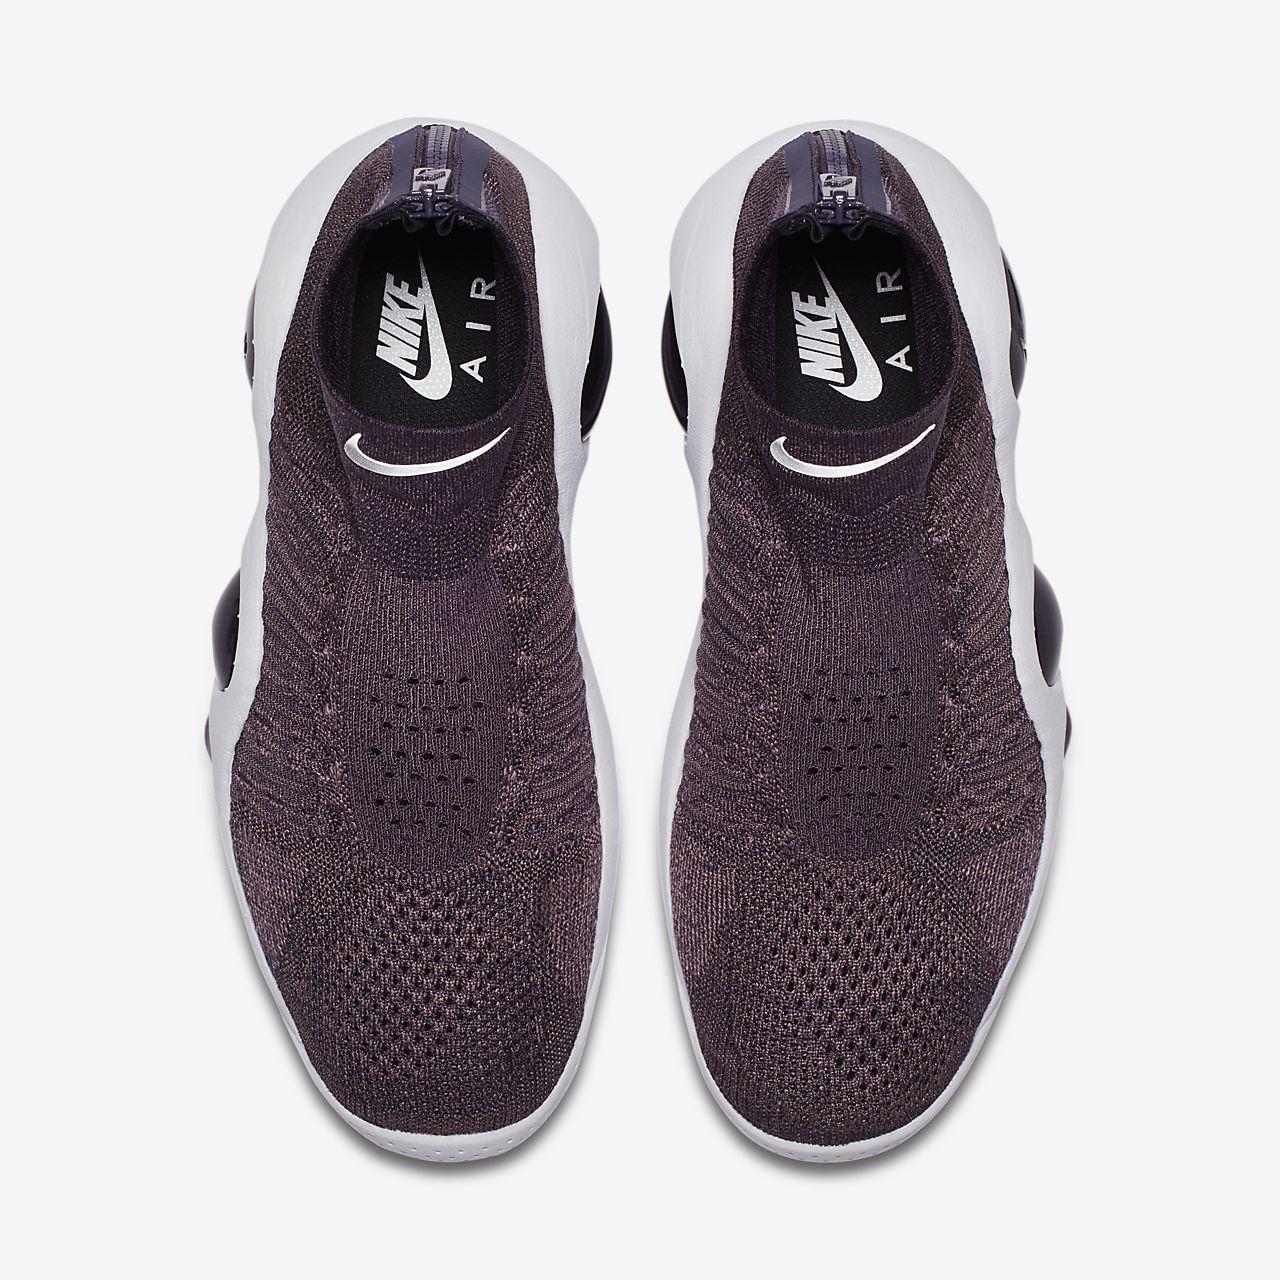 6bd3f7aee1cc Nike Flight Bonafide Men s Shoe. Nike.com LU